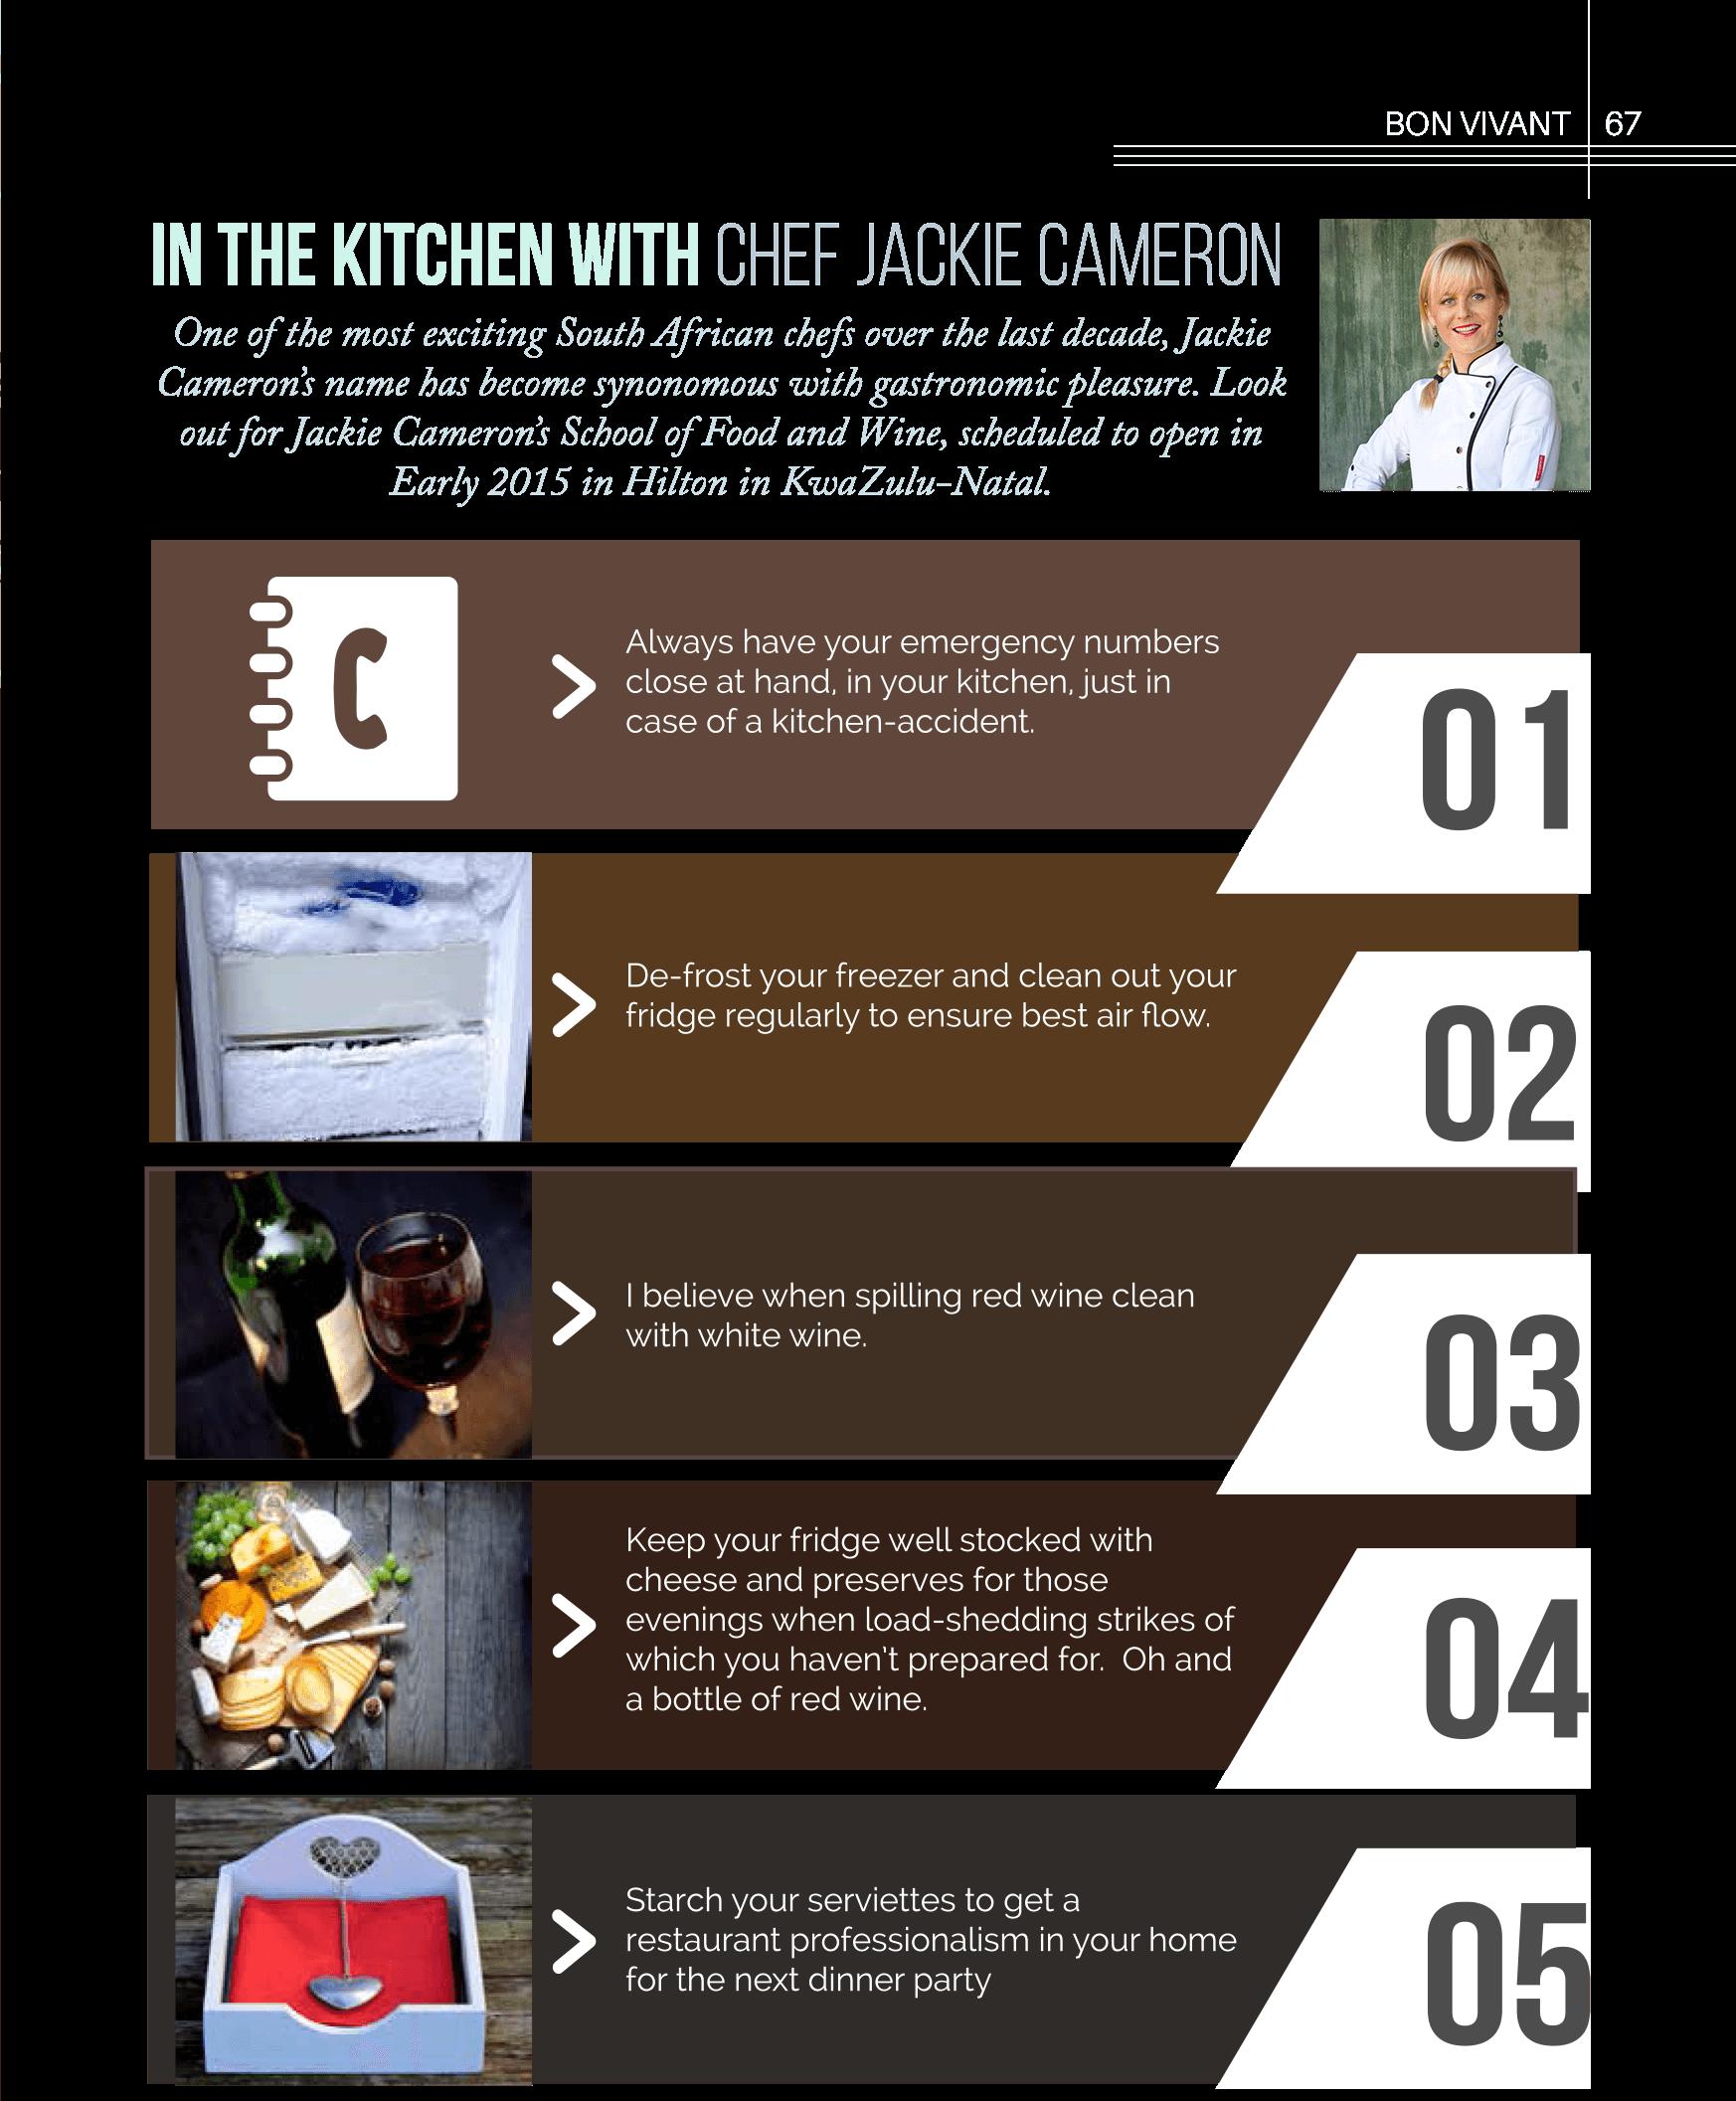 Bon Vivant Cooking Tips